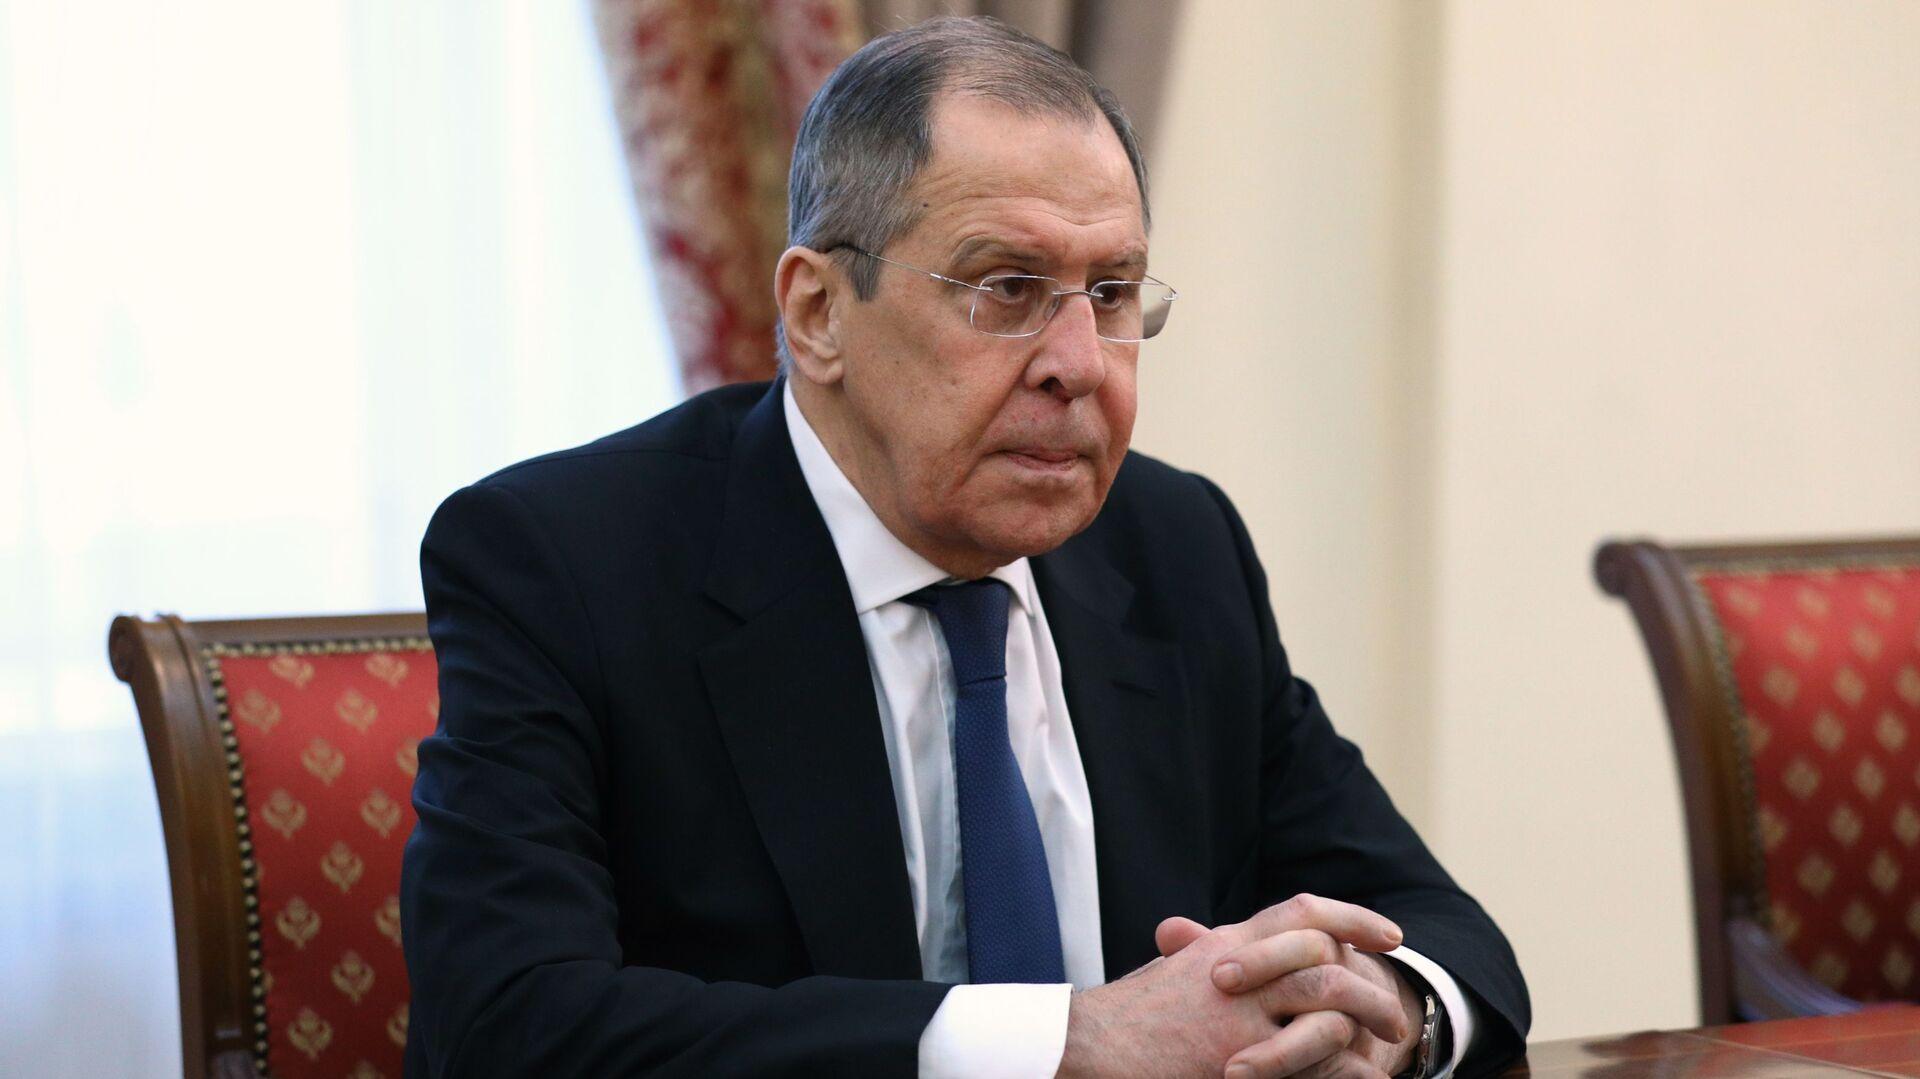 La visita oficial del ministro de Exteriores ruso, Serguéi Lavrov, a Ereván - Sputnik Mundo, 1920, 02.03.2021